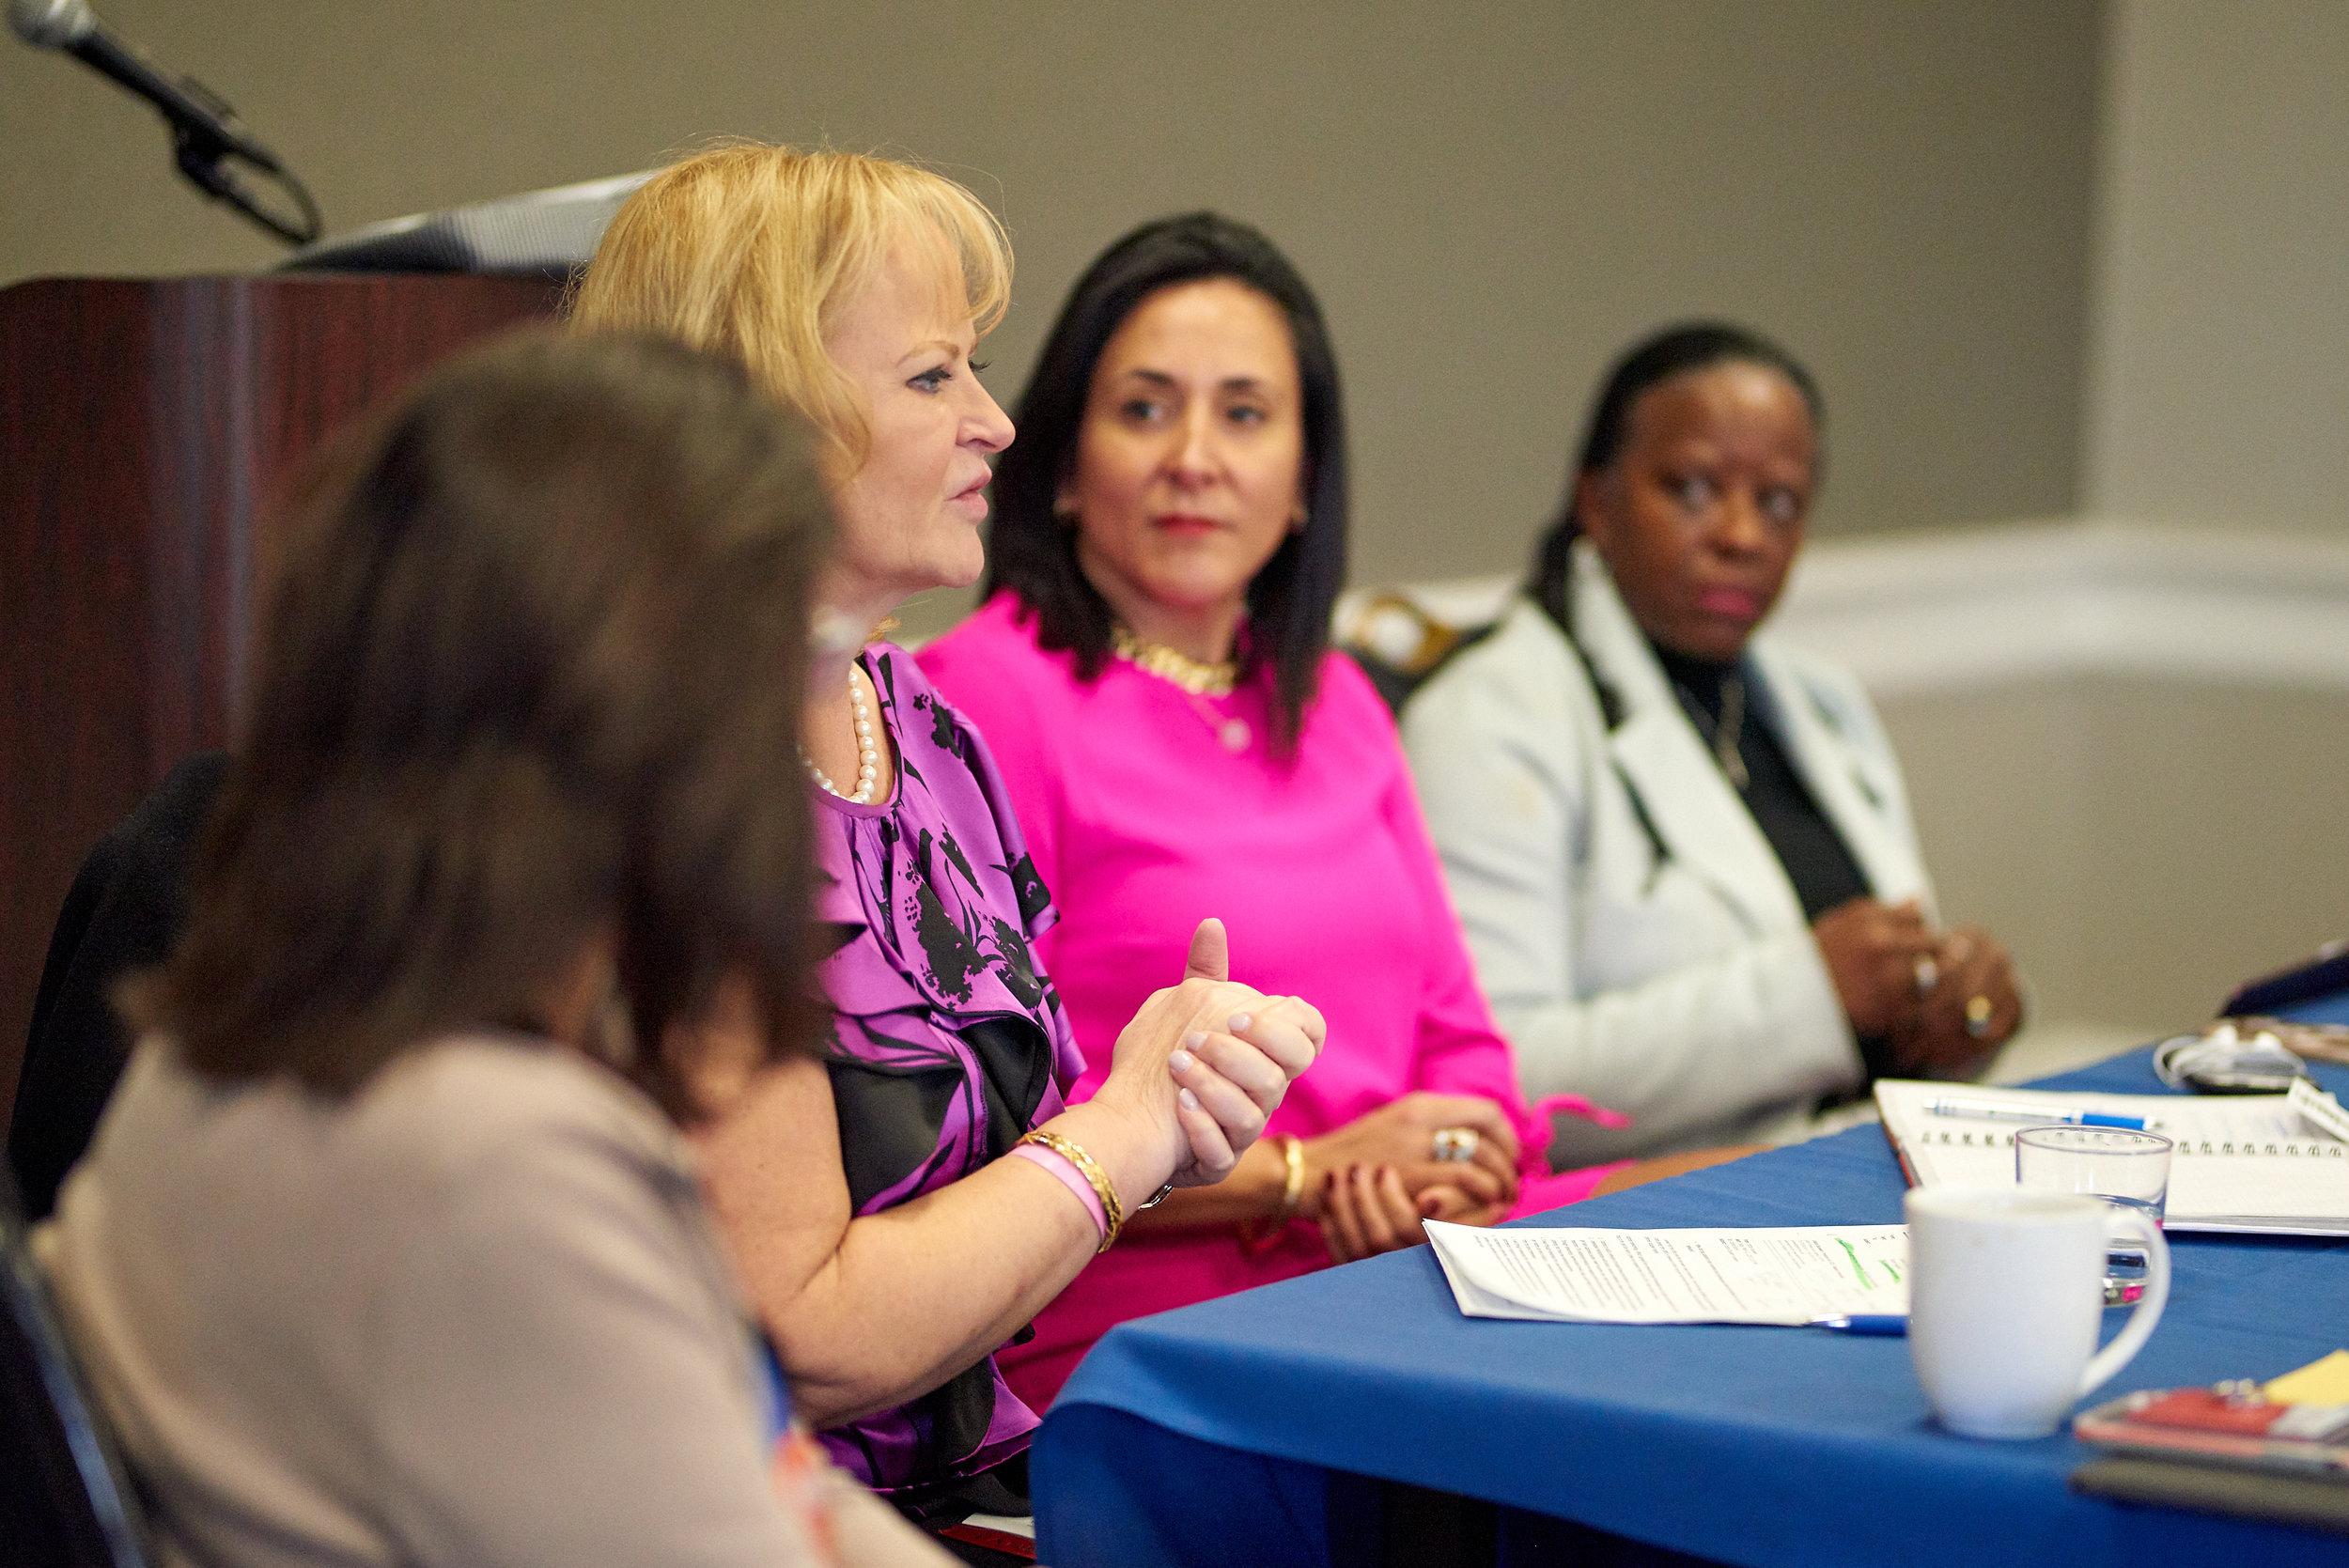 Left to right (panelists): Janice Tippett, Kristina Bouweiri, Angela Franco, Sandra P. Eberhard.